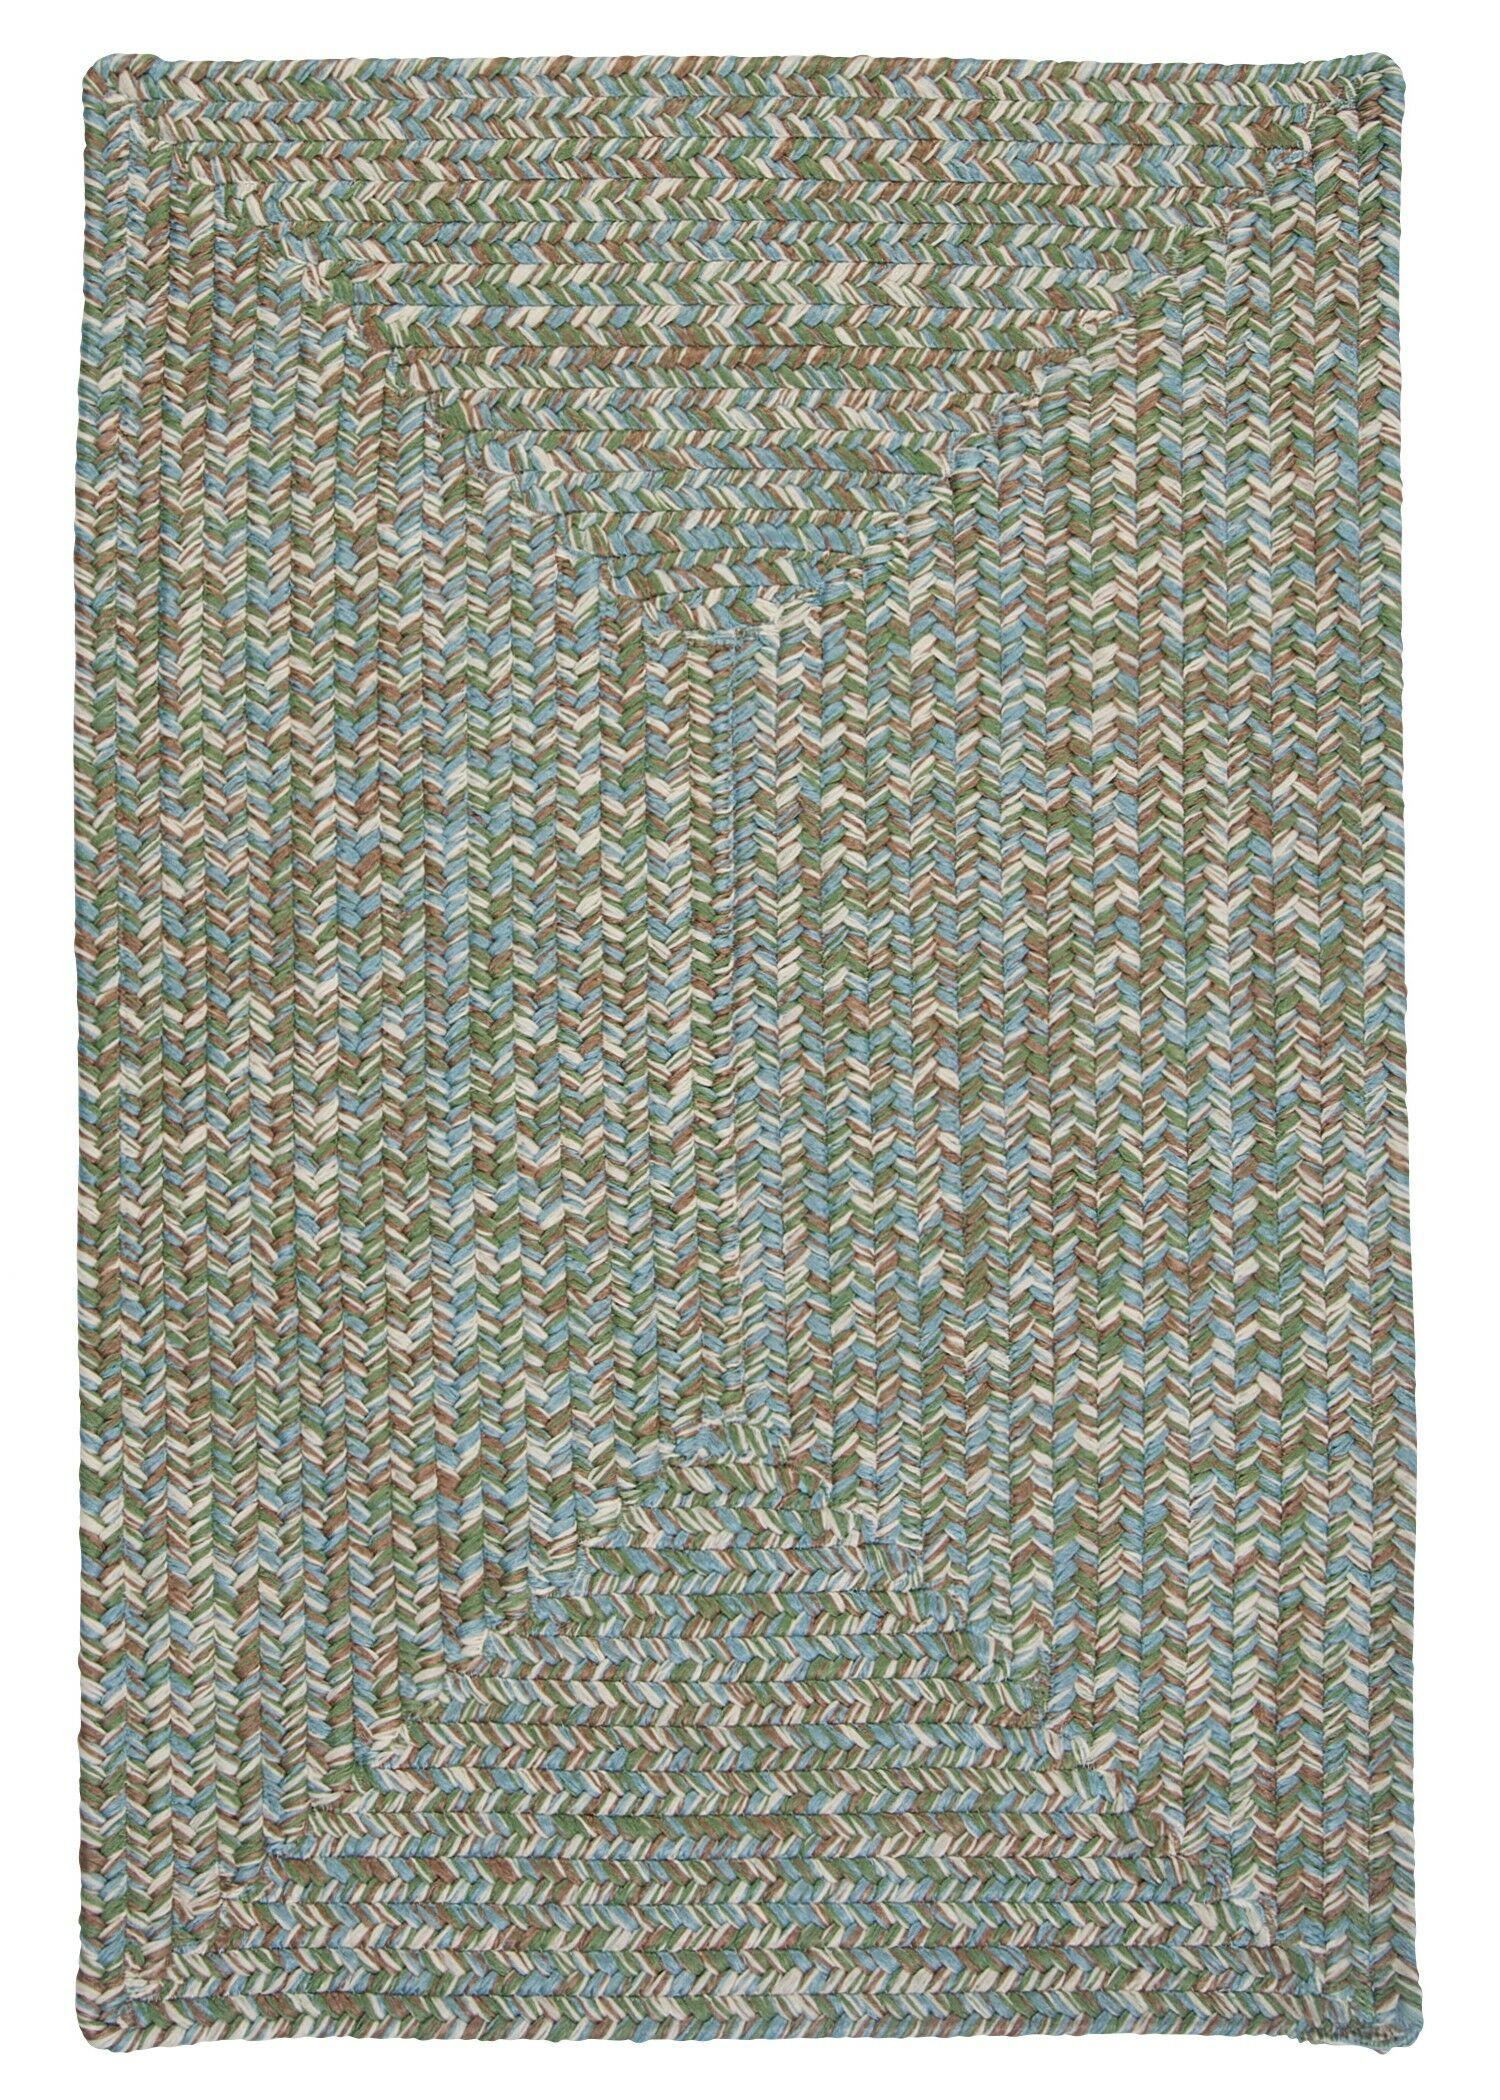 Beltran Seagrass Braided Area Rug Rug Size: Runner 2' x 12'